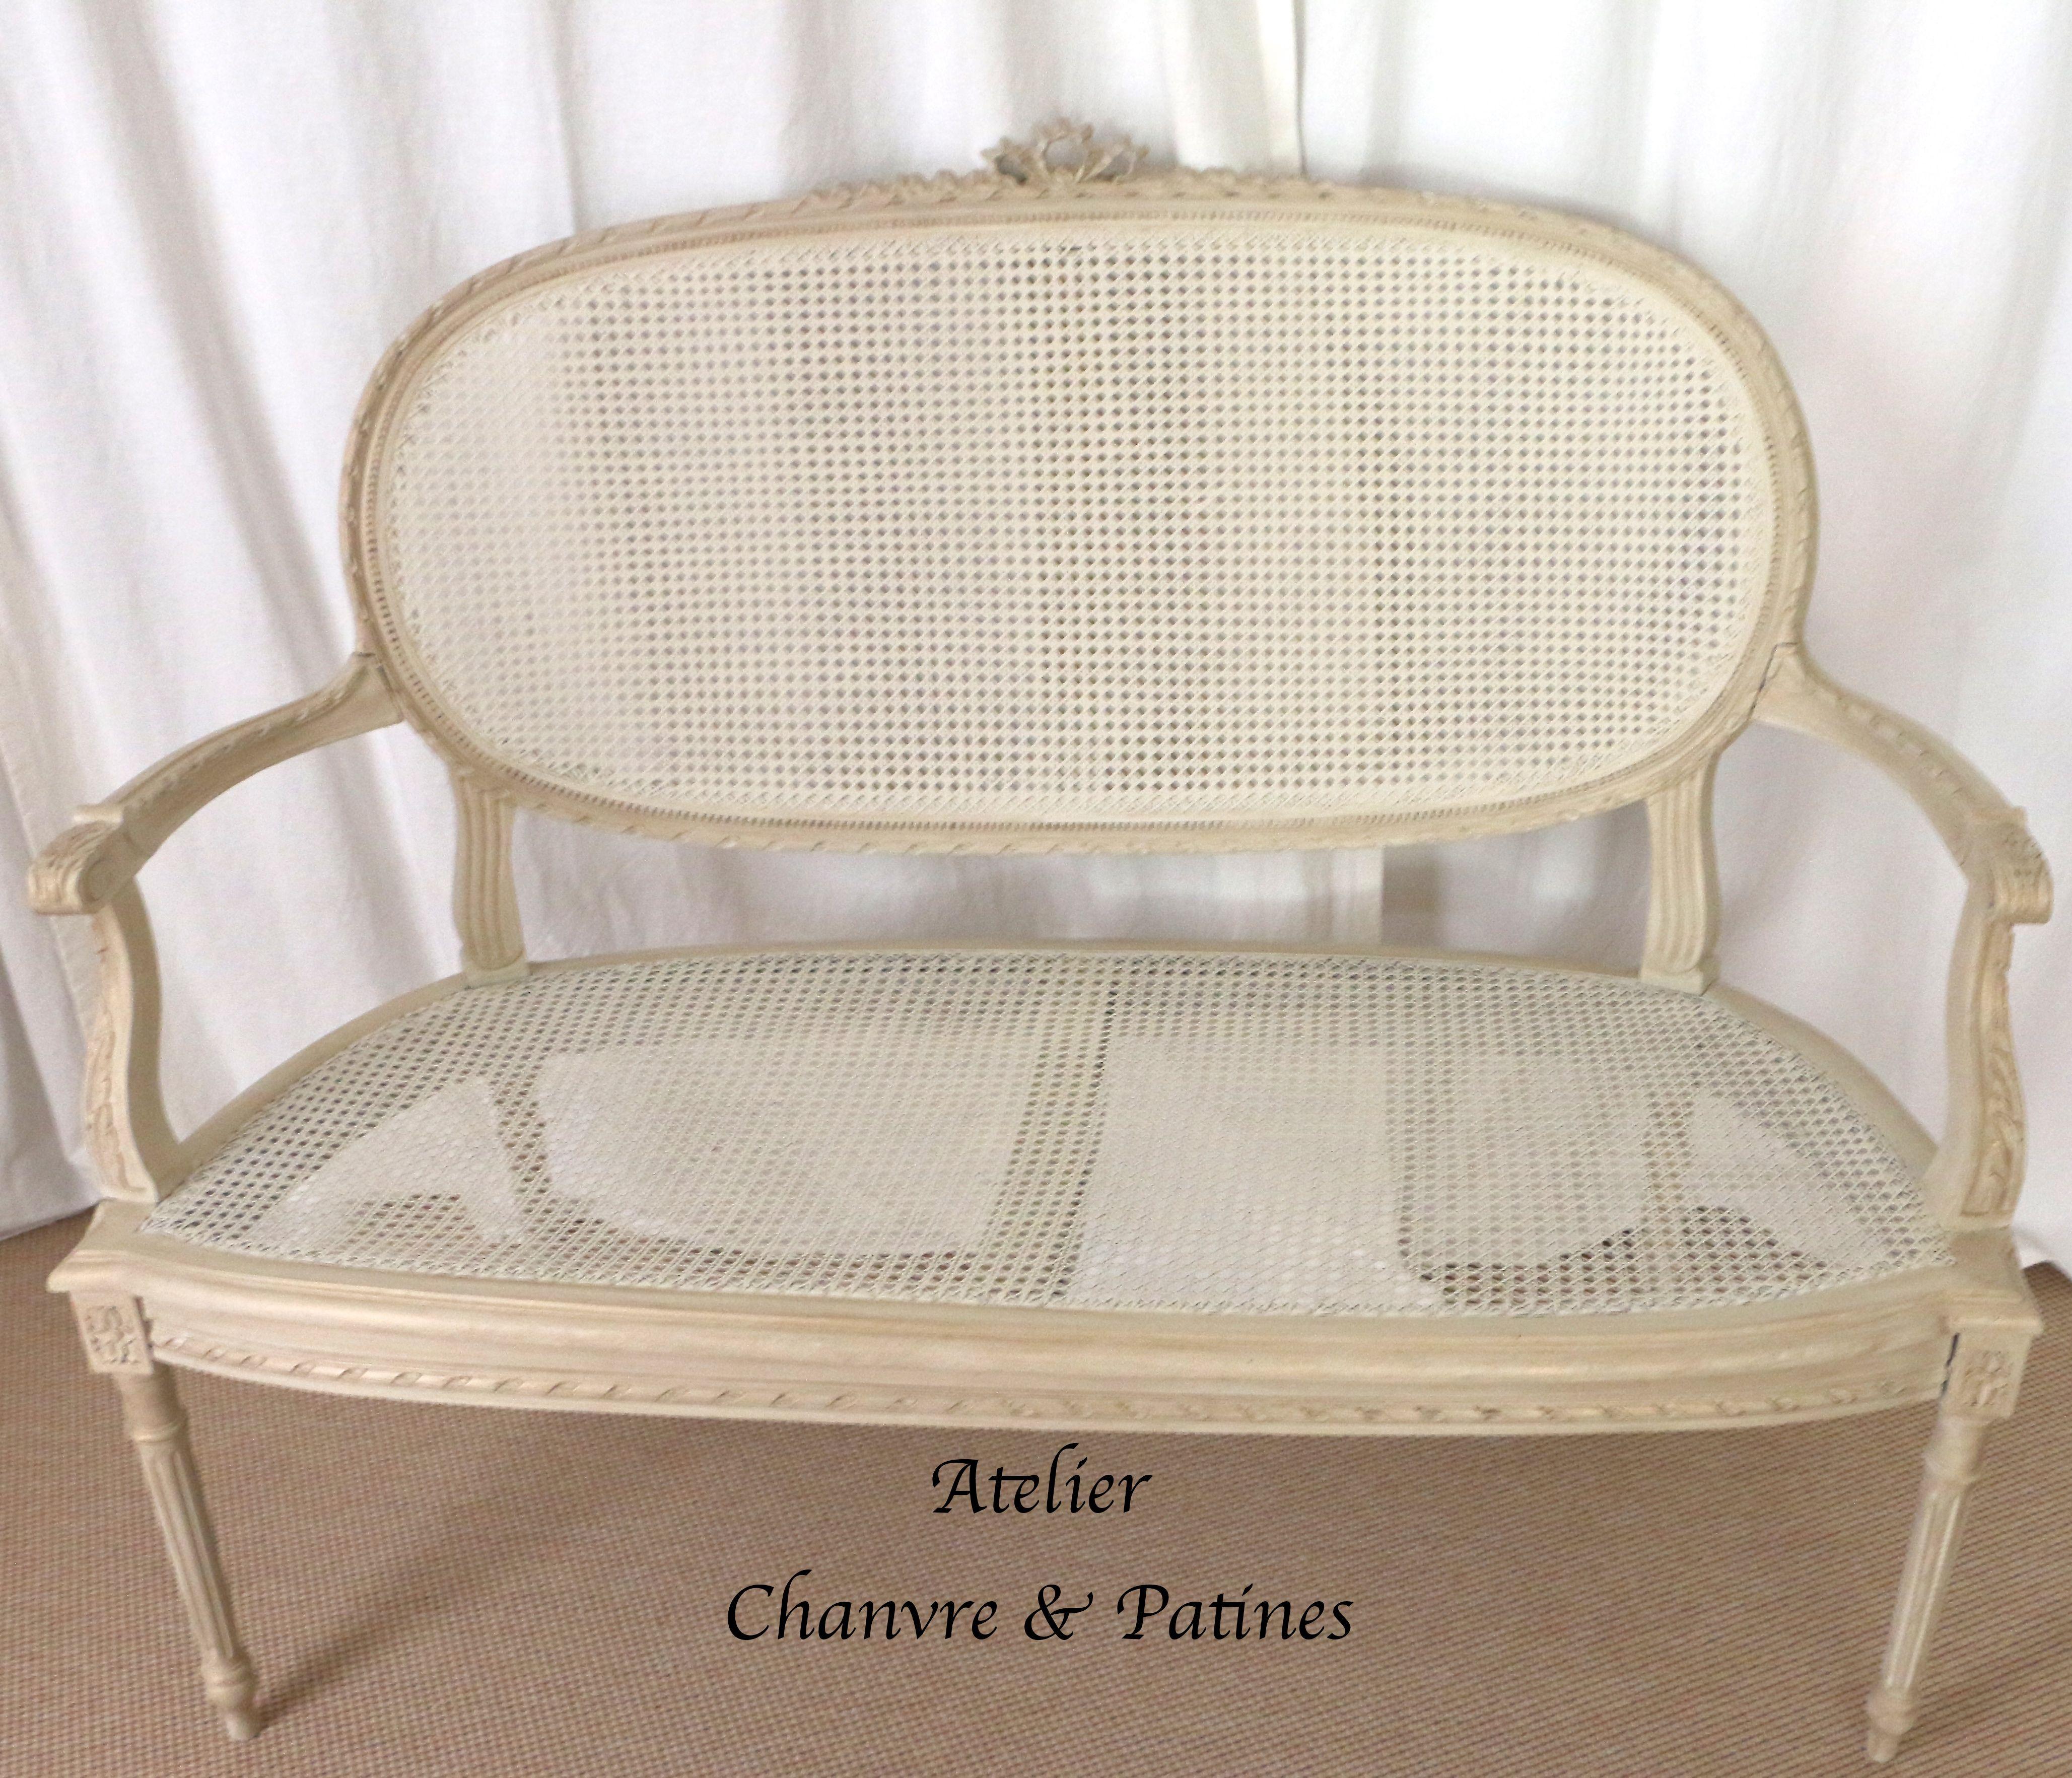 Atelier Chanvre Patines Banquette Cannee Louis Xv Fauteuil